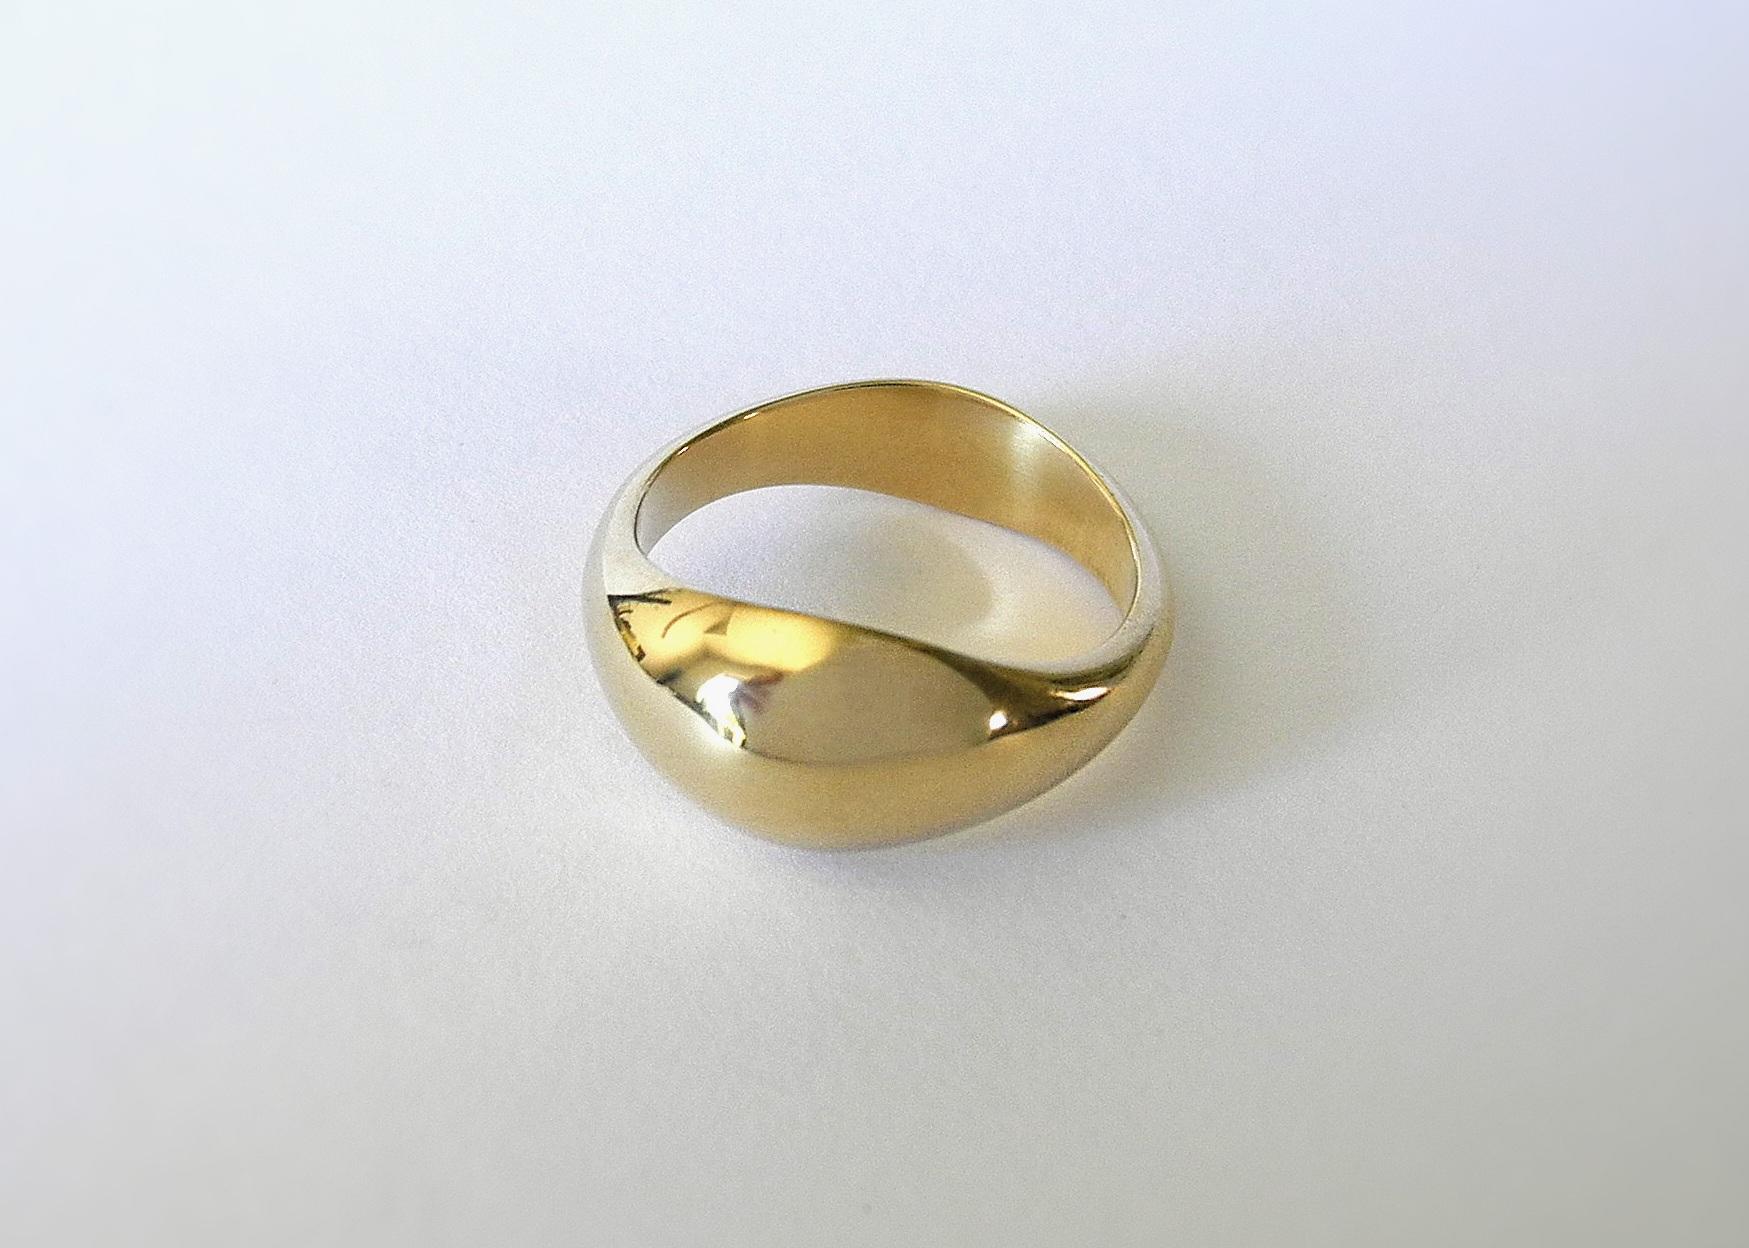 DAVID Wedding Ring:  Hand-carved custom shape, 18k yellow gold.